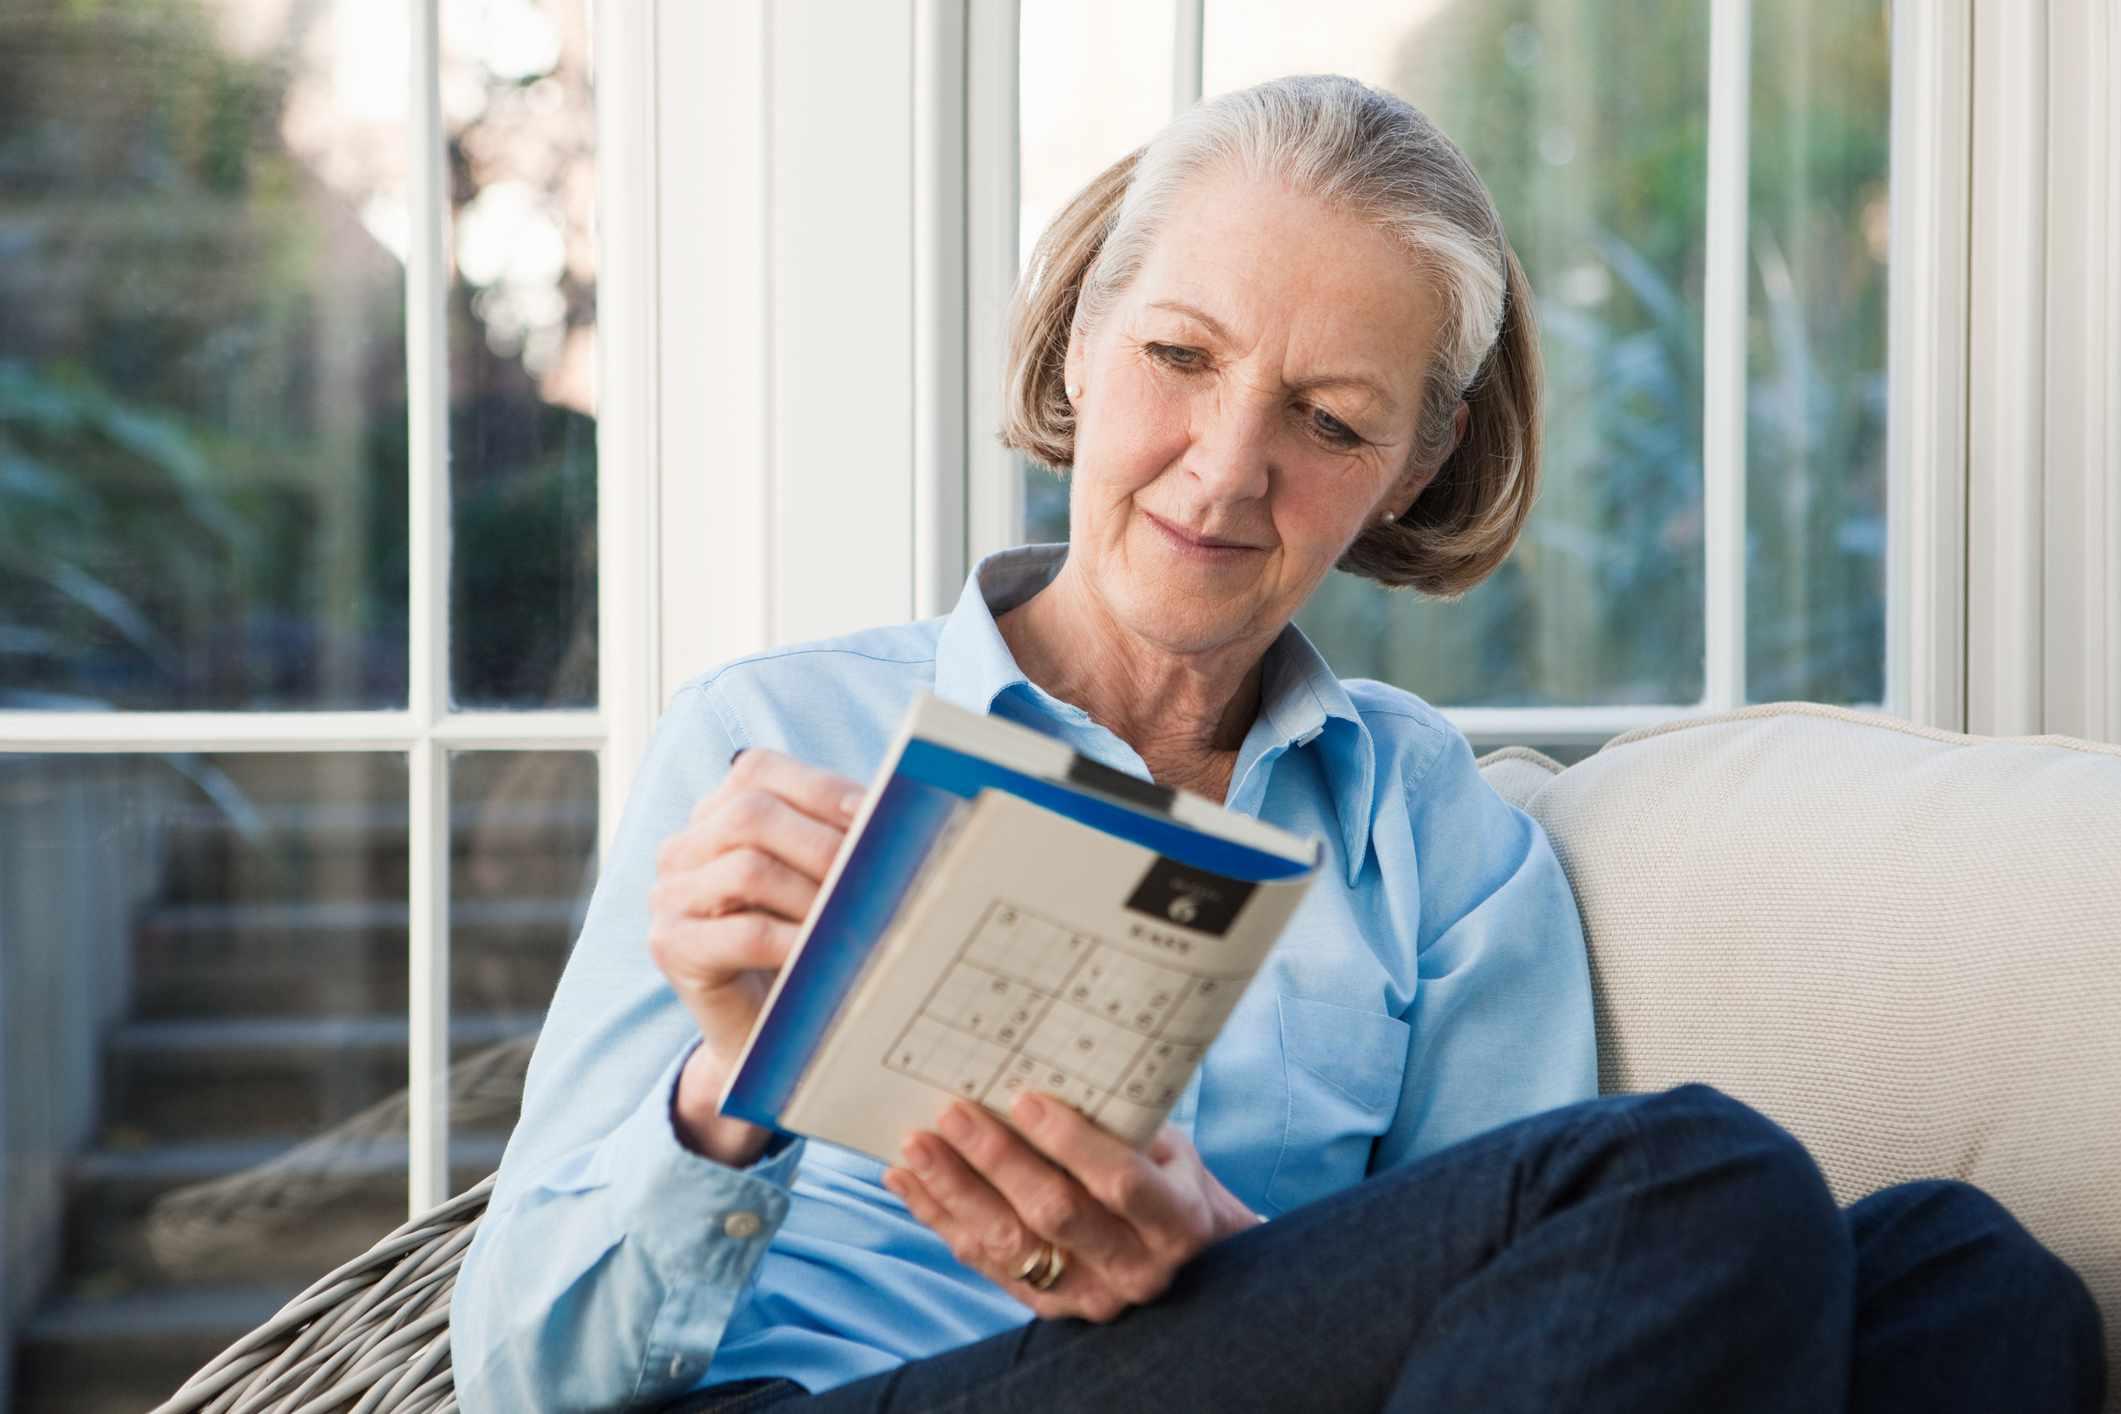 Senior woman doing sudoku puzzles